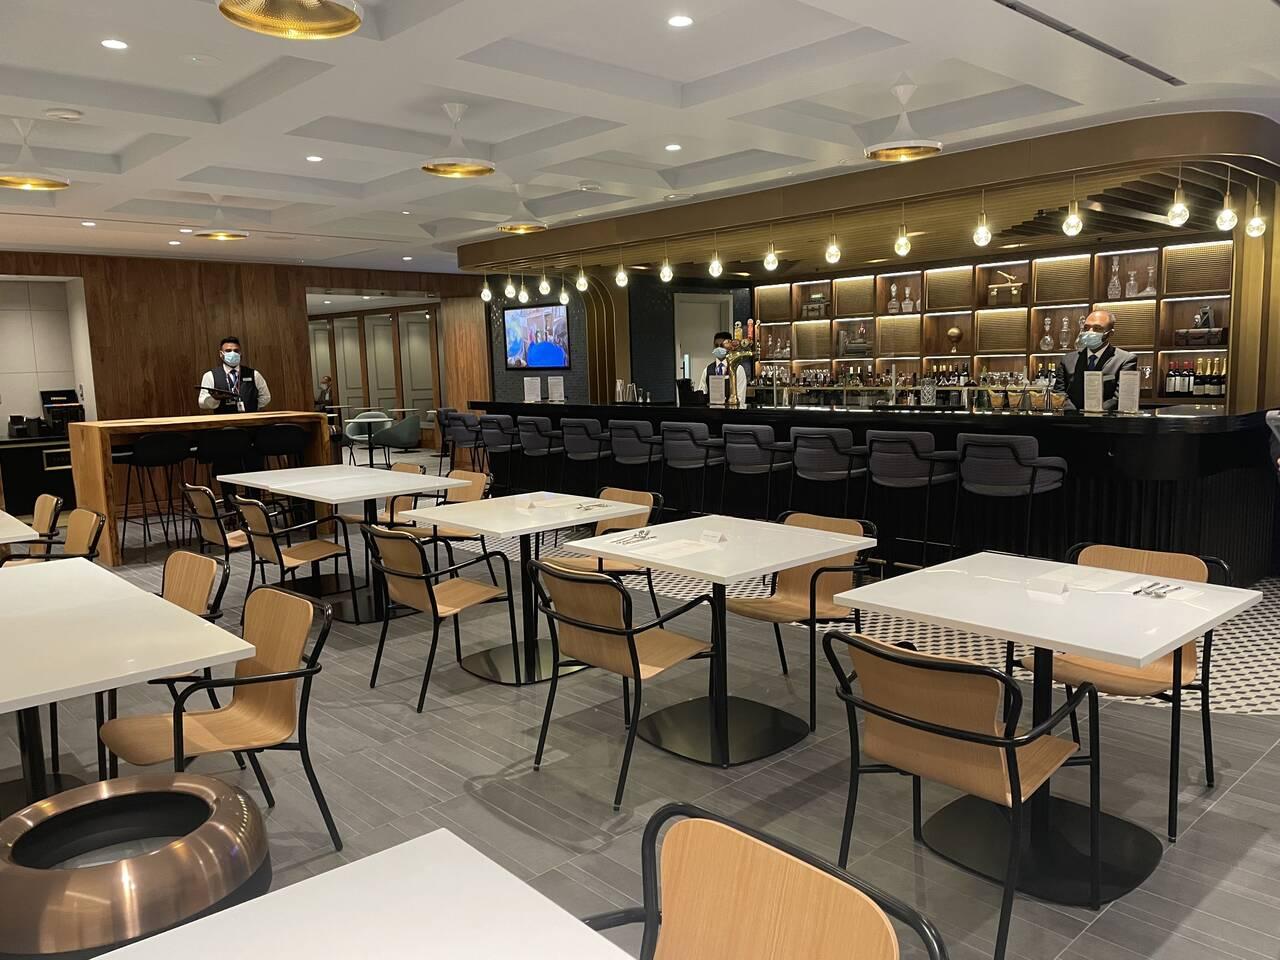 American Express Centurion Lounge London Heathrow dining room